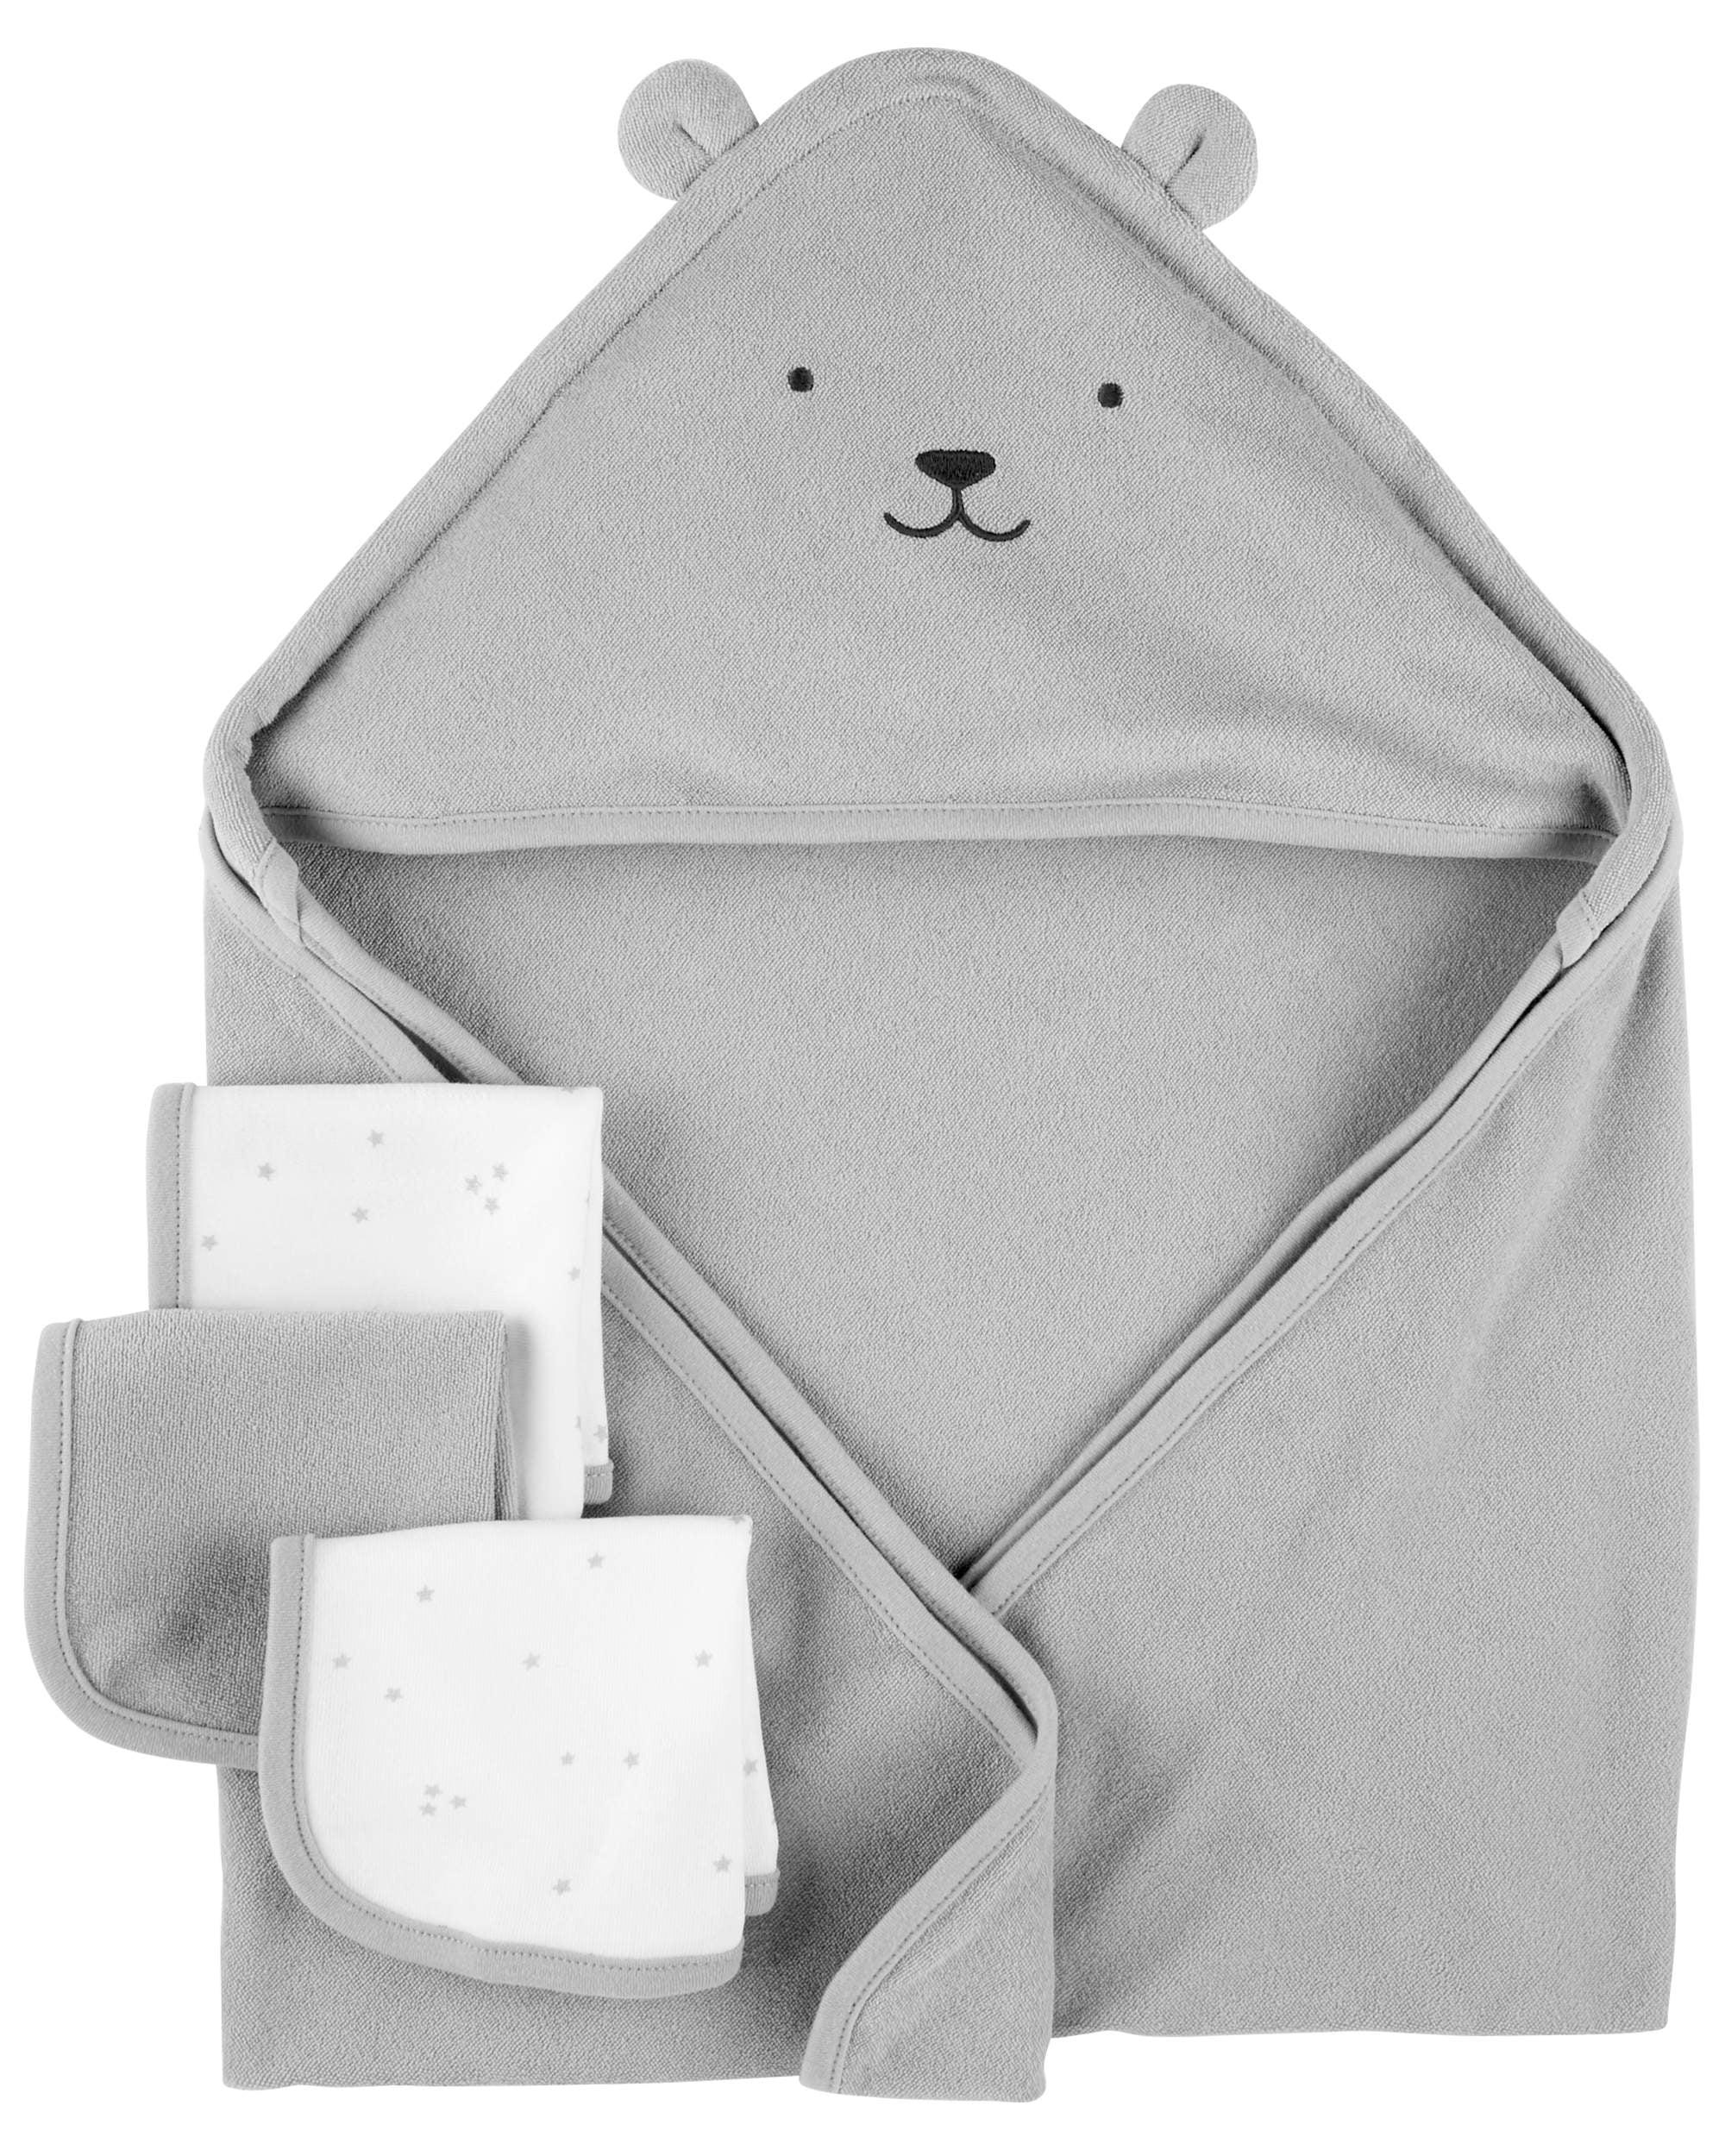 Carter's Hooded Towels & Washcloths Set, 4pc, Grey Bear